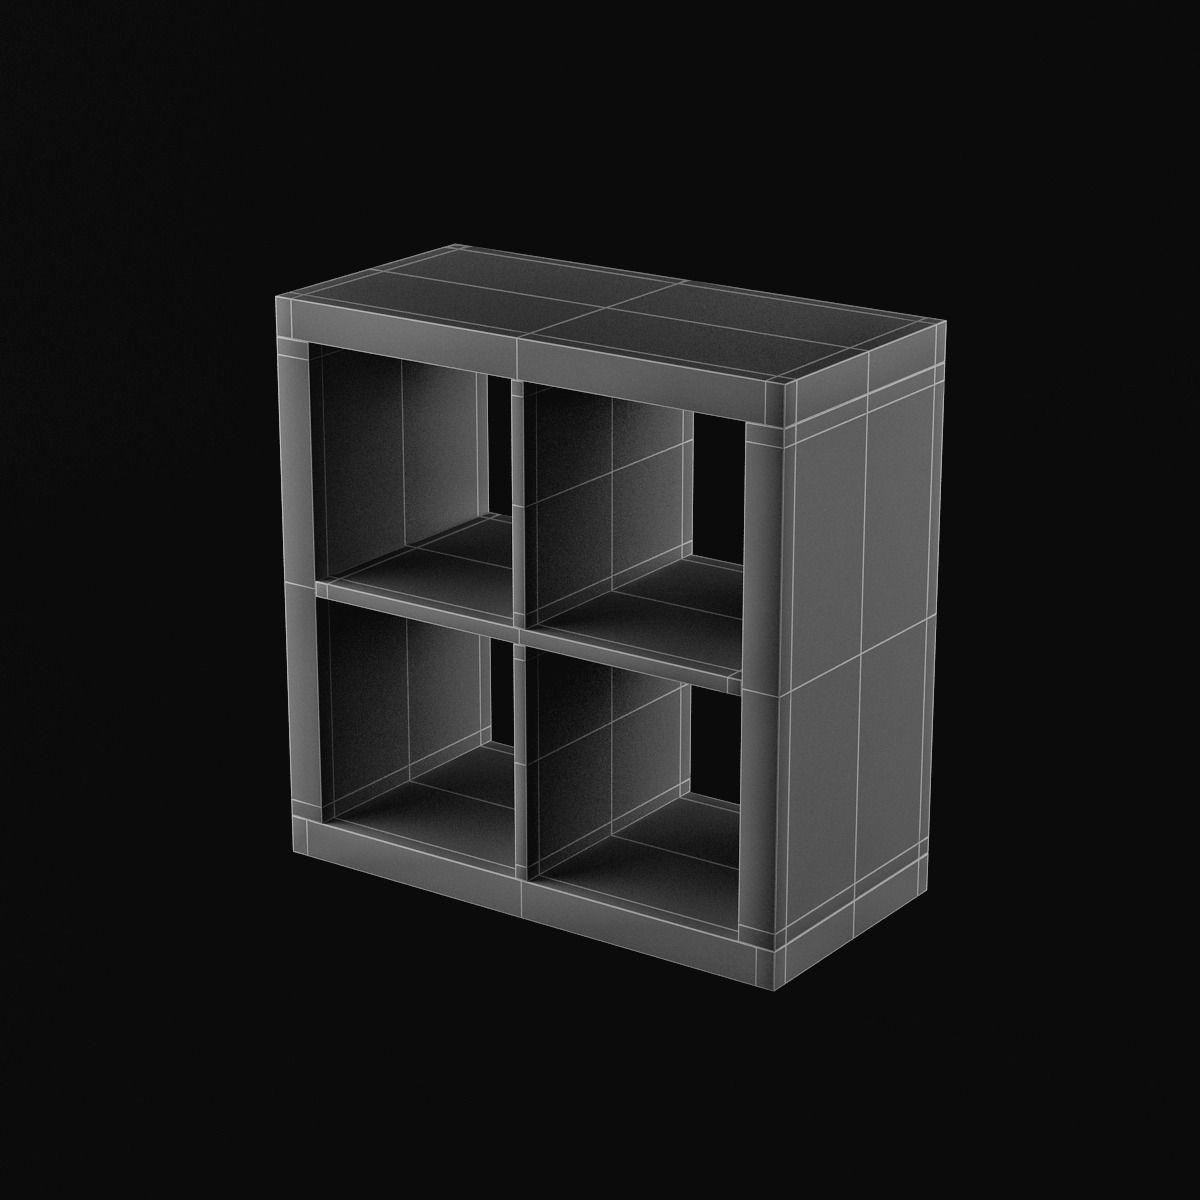 ikea expedit shelving unit 03 3d model max. Black Bedroom Furniture Sets. Home Design Ideas